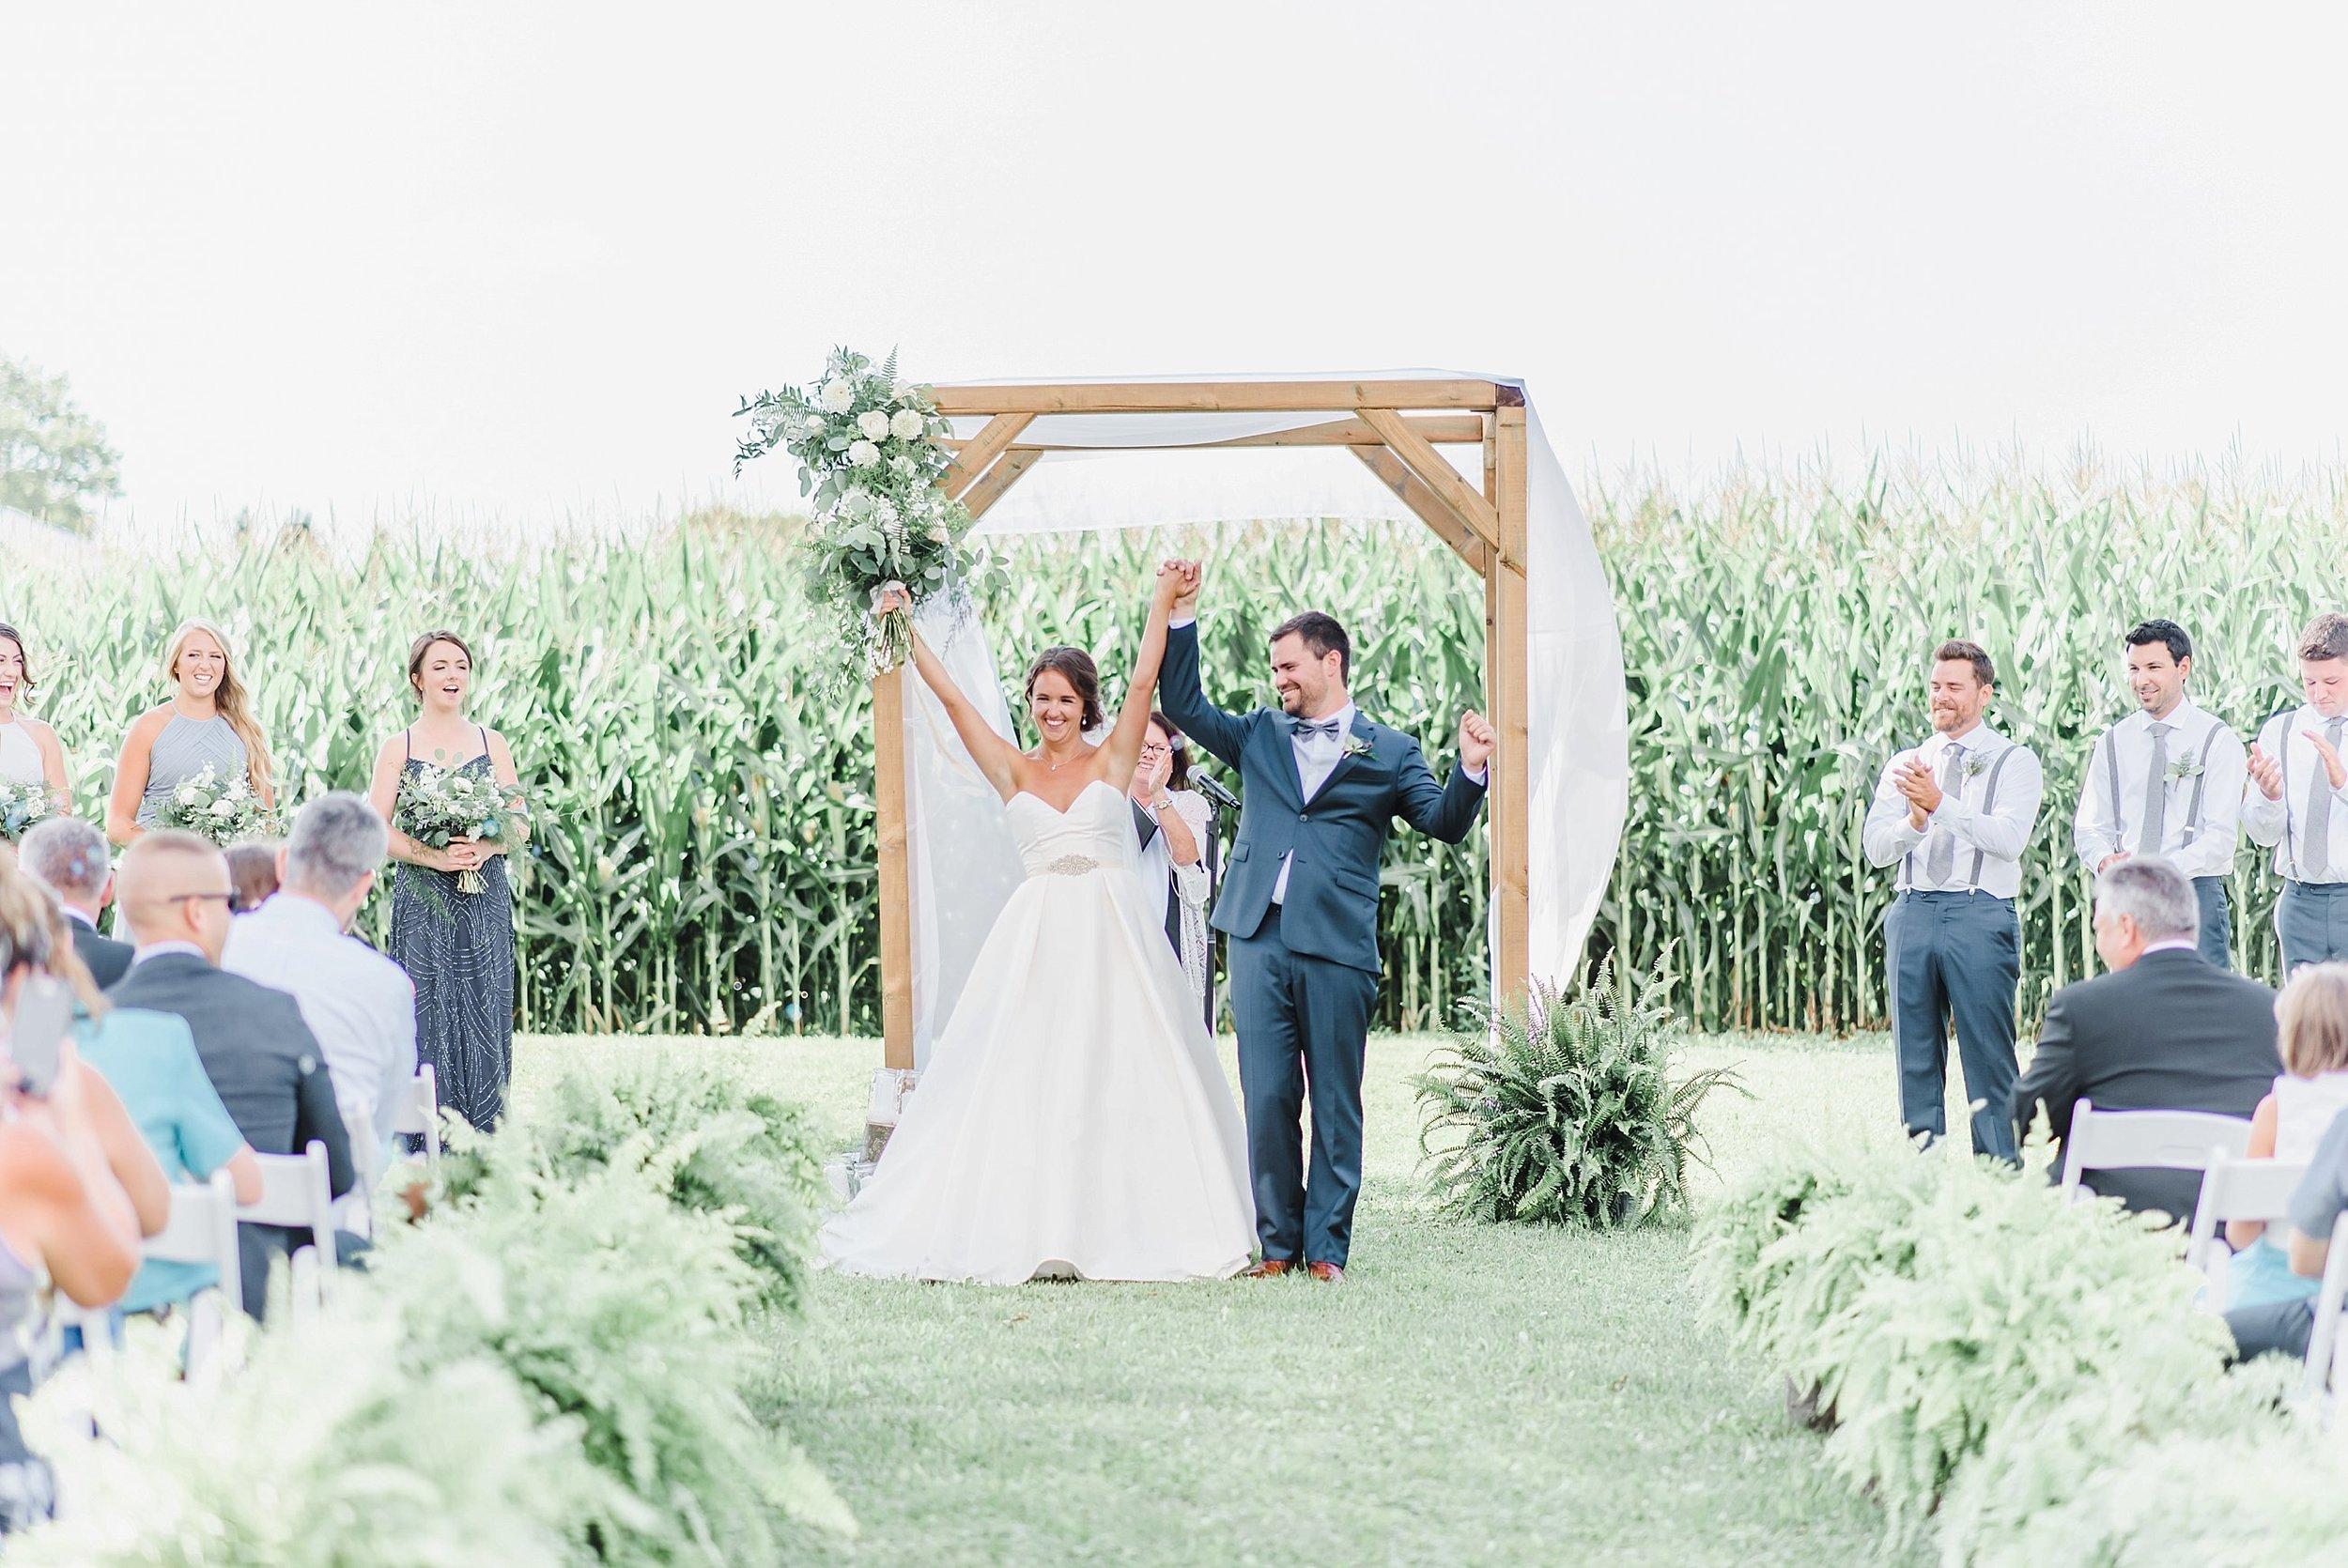 light airy indie fine art ottawa wedding photographer | Ali and Batoul Photography_0539.jpg